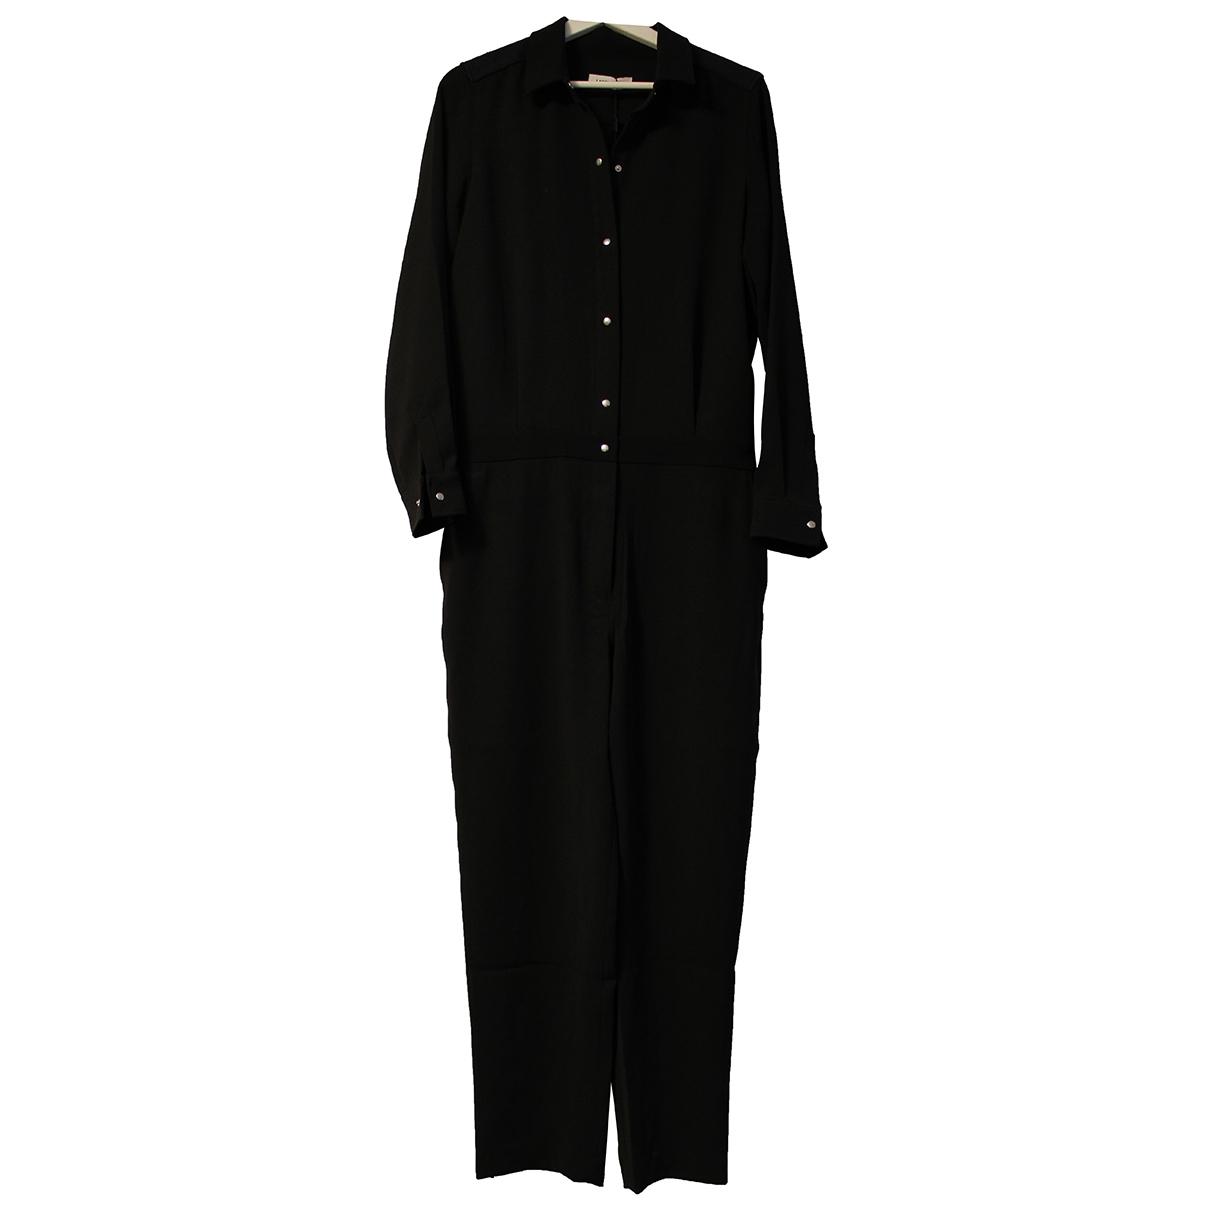 Lacoste \N Black jumpsuit for Women M International